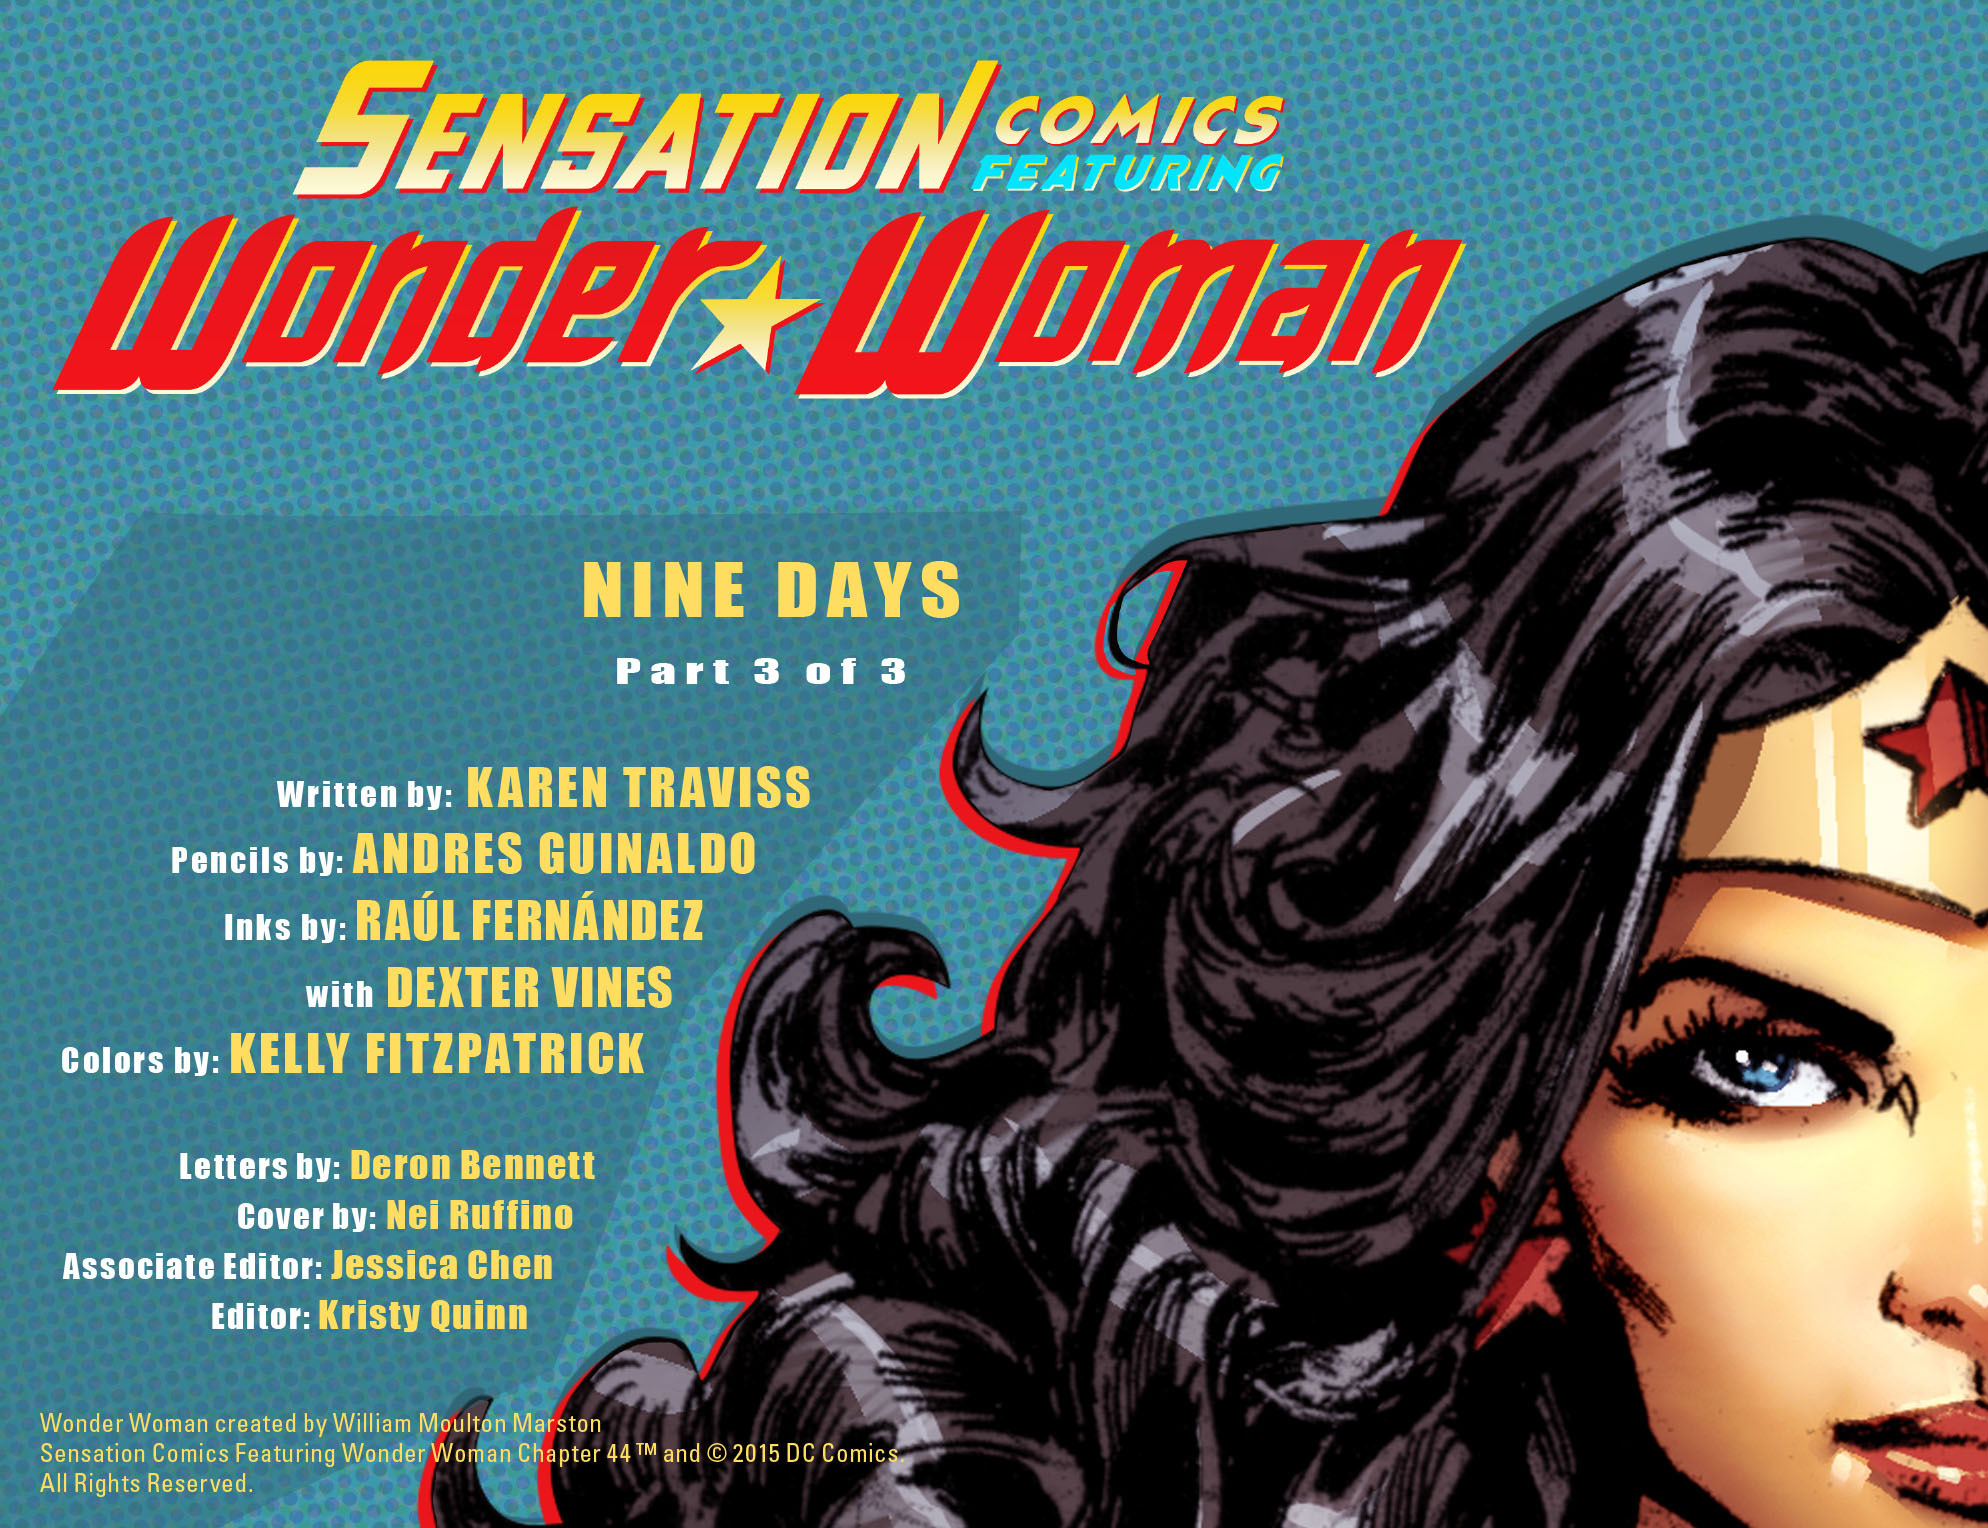 Read online Sensation Comics Featuring Wonder Woman comic -  Issue #44 - 3